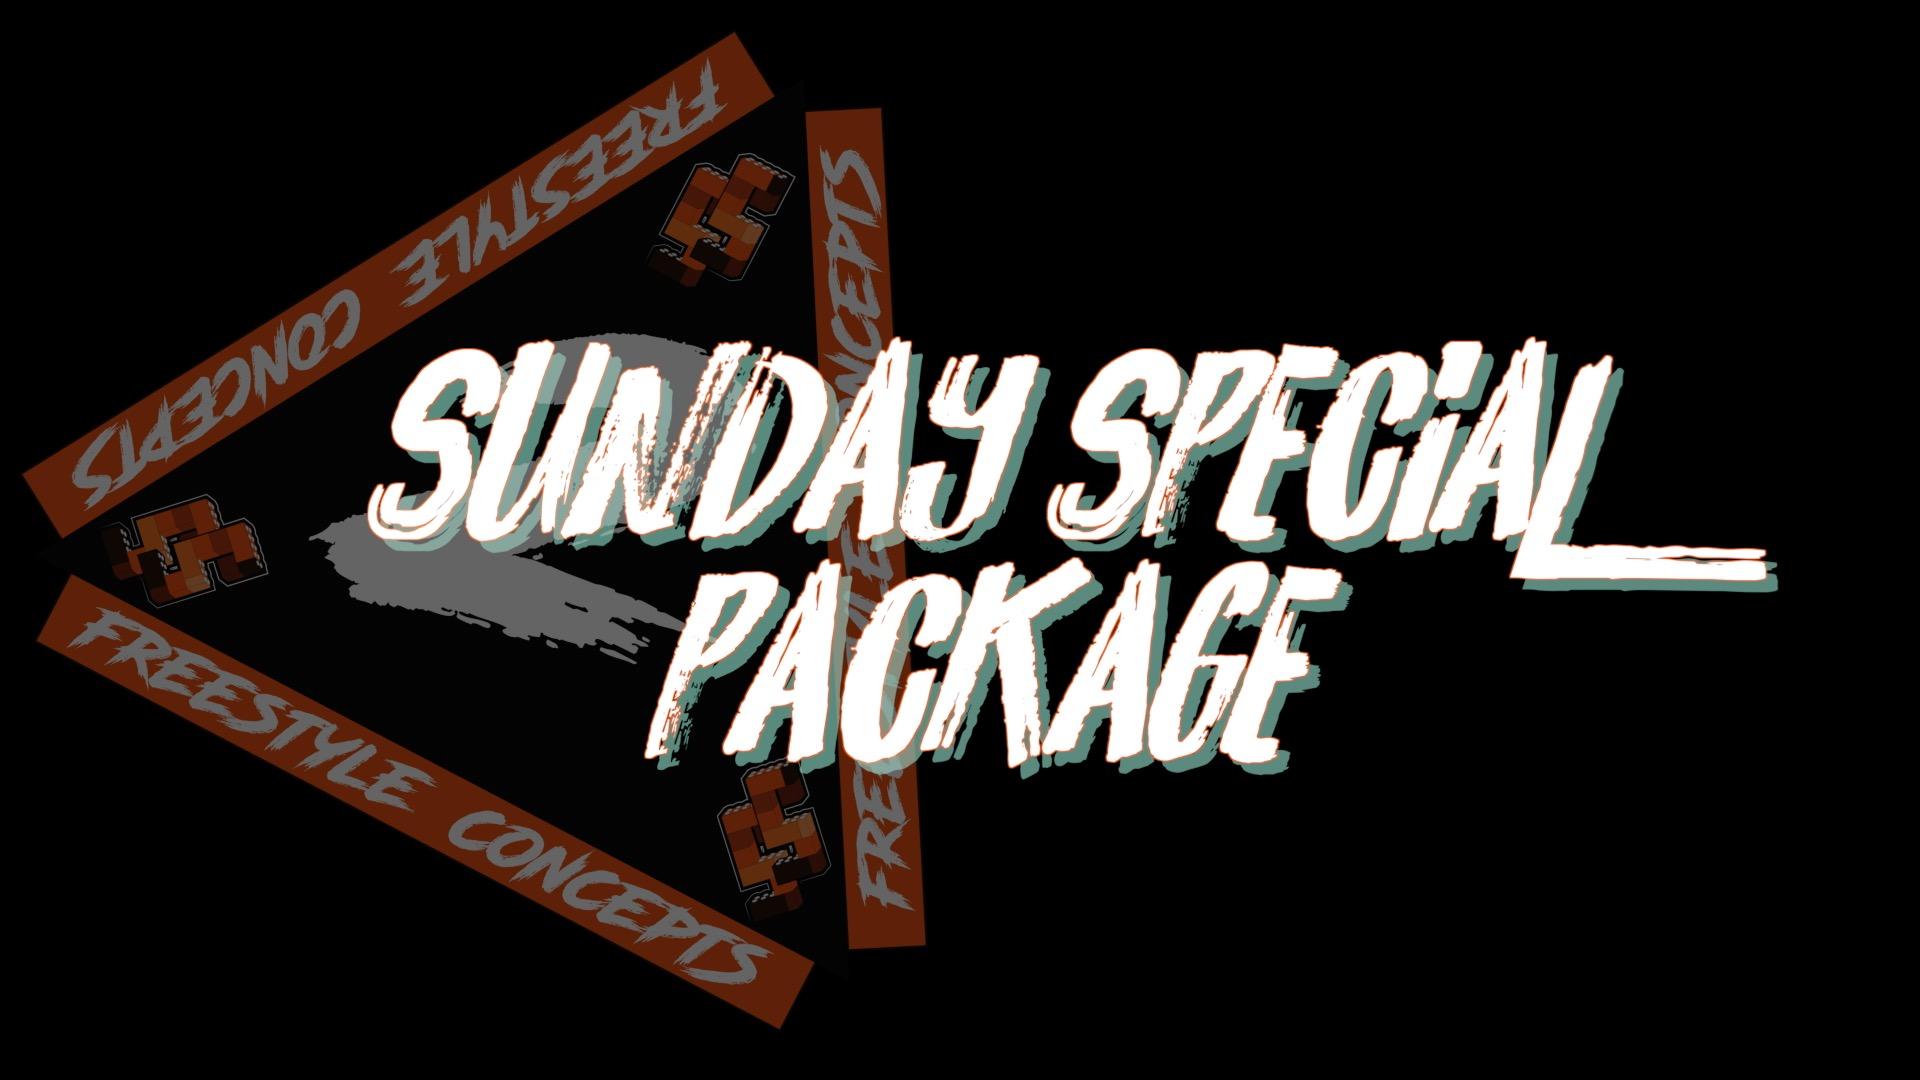 SundaySpecialPackage.jpg